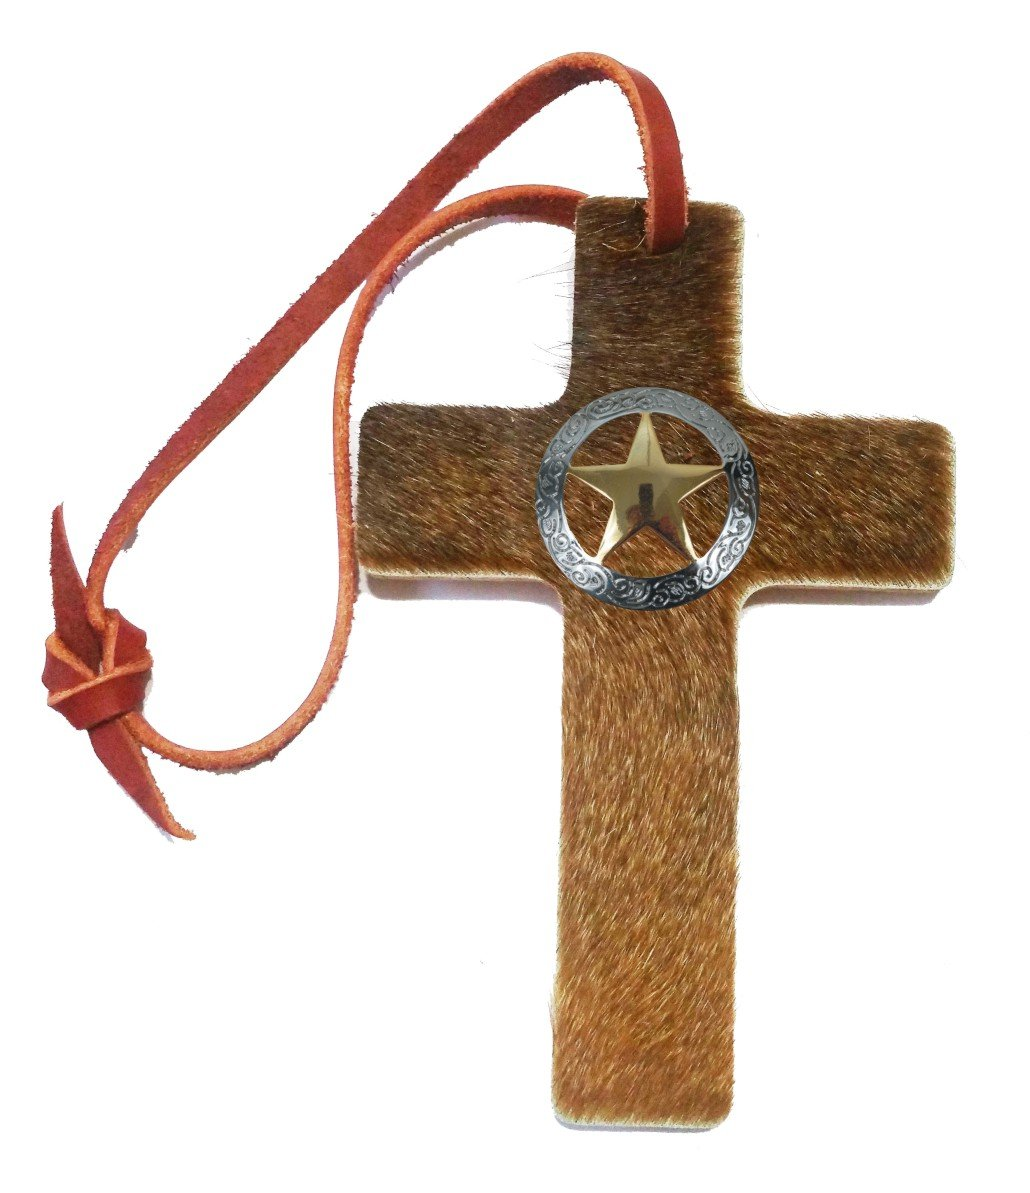 Custom Texas Ranger Hair on Hide Leather Saddle Cross. Made in Texas by Texans